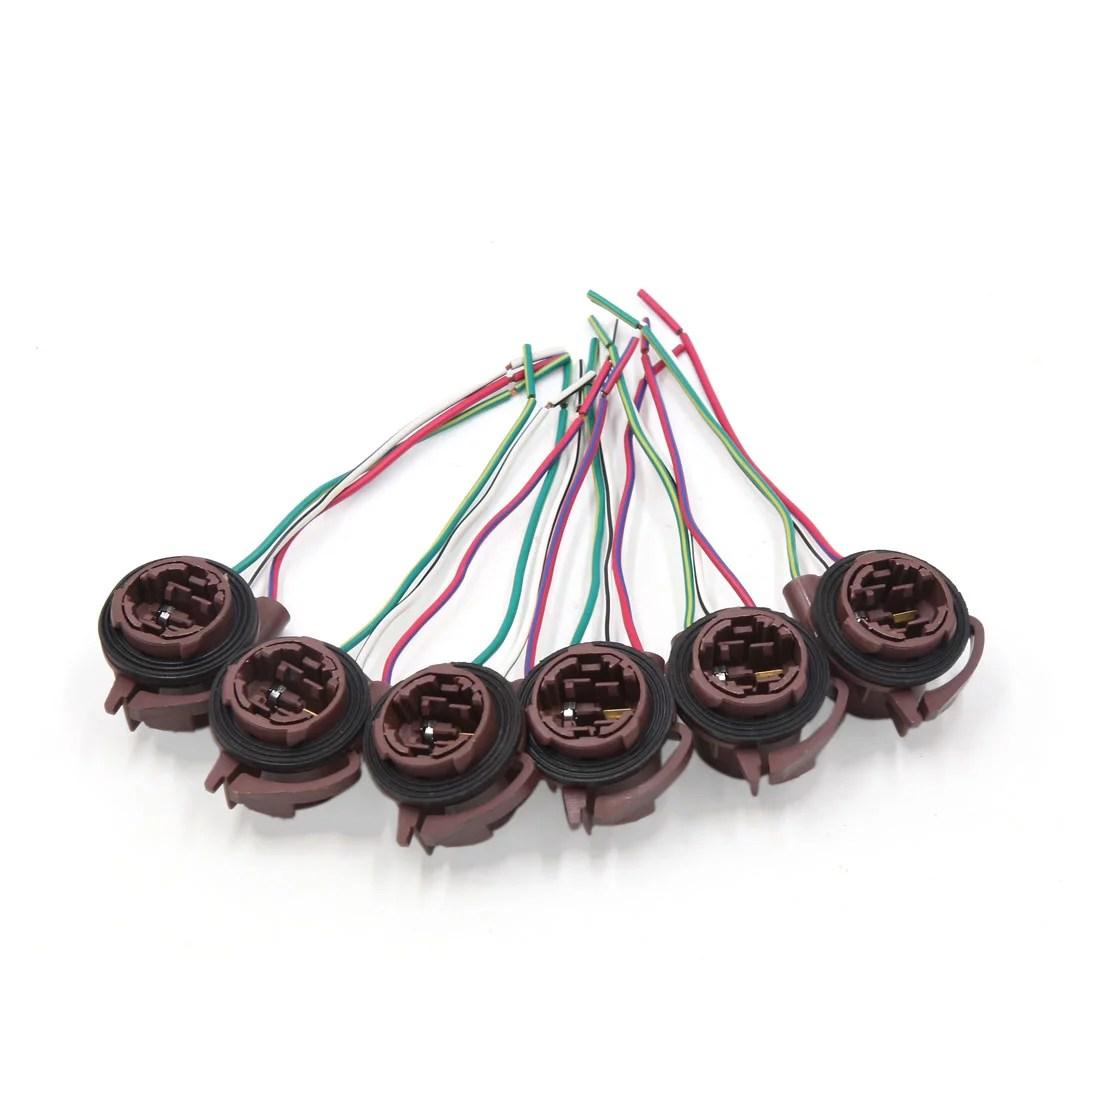 hight resolution of 6pcs 3157 4157 brake light lamp bulb wiring harness socket connector for car walmart com